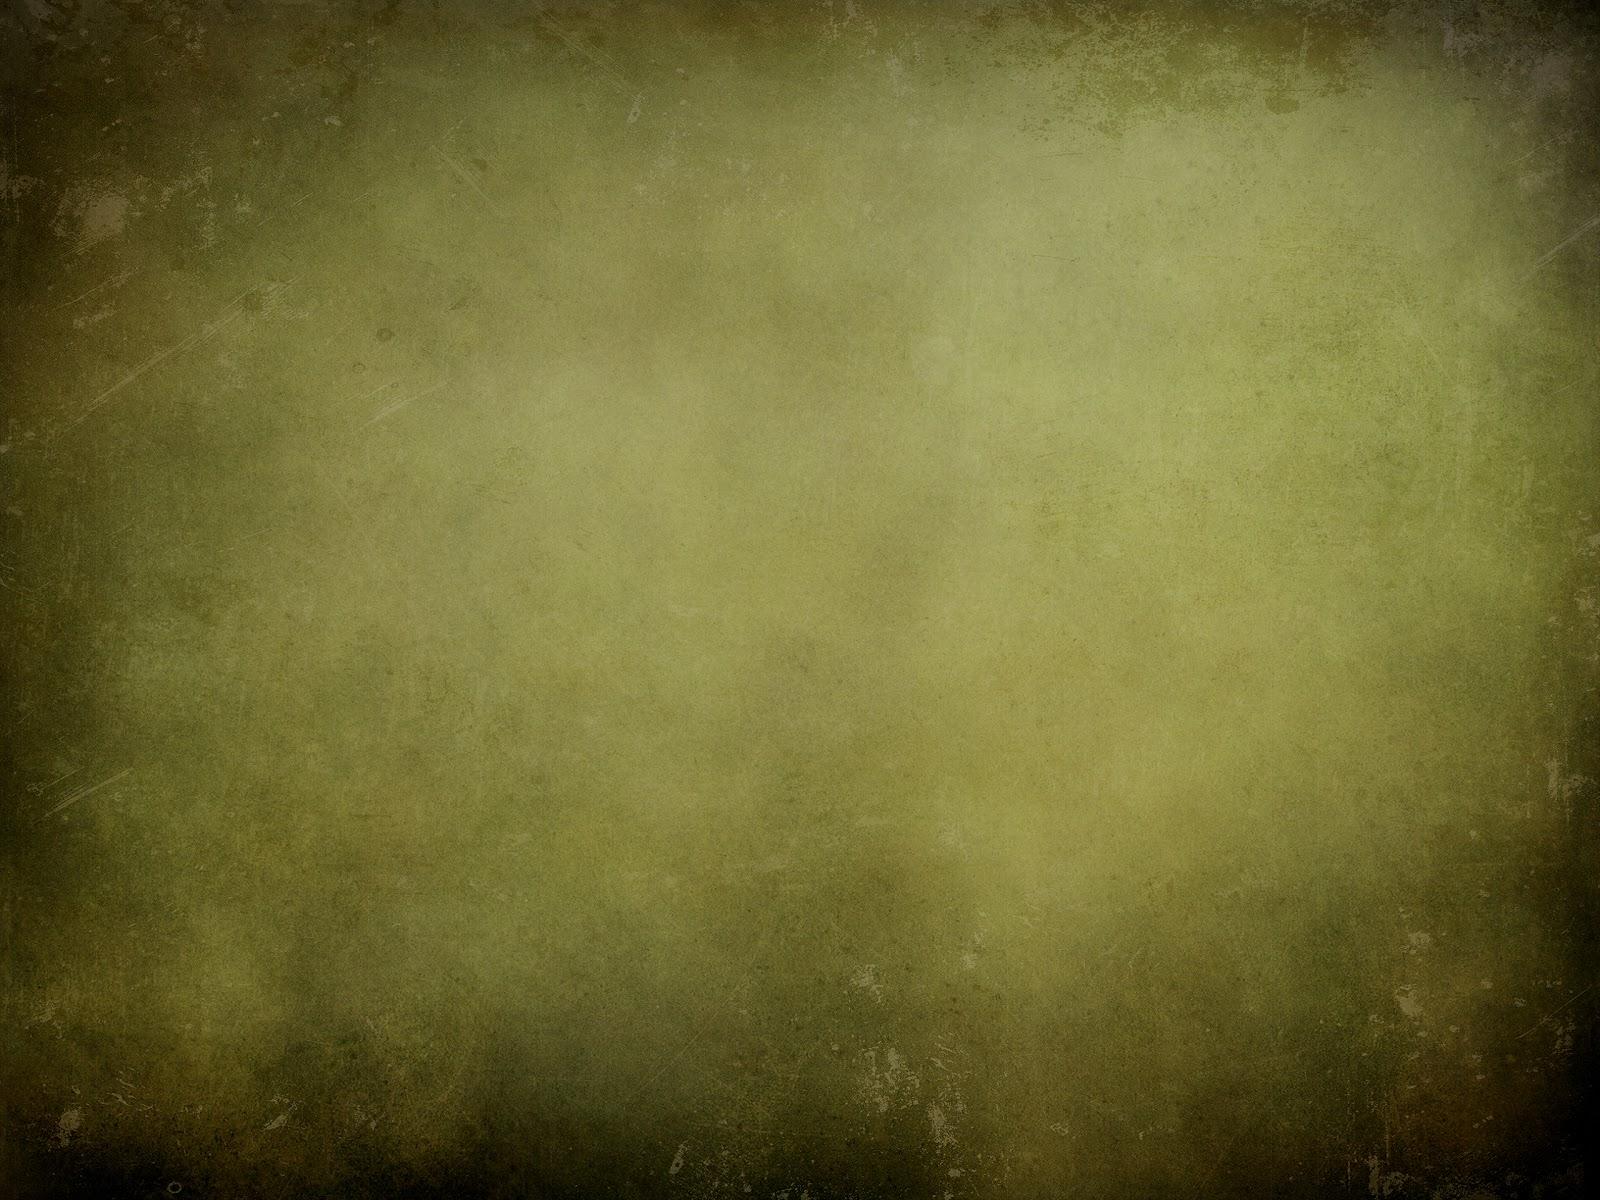 Tan Wallpaper Texture Download Wallpaper DaWallpaperz 1600x1200